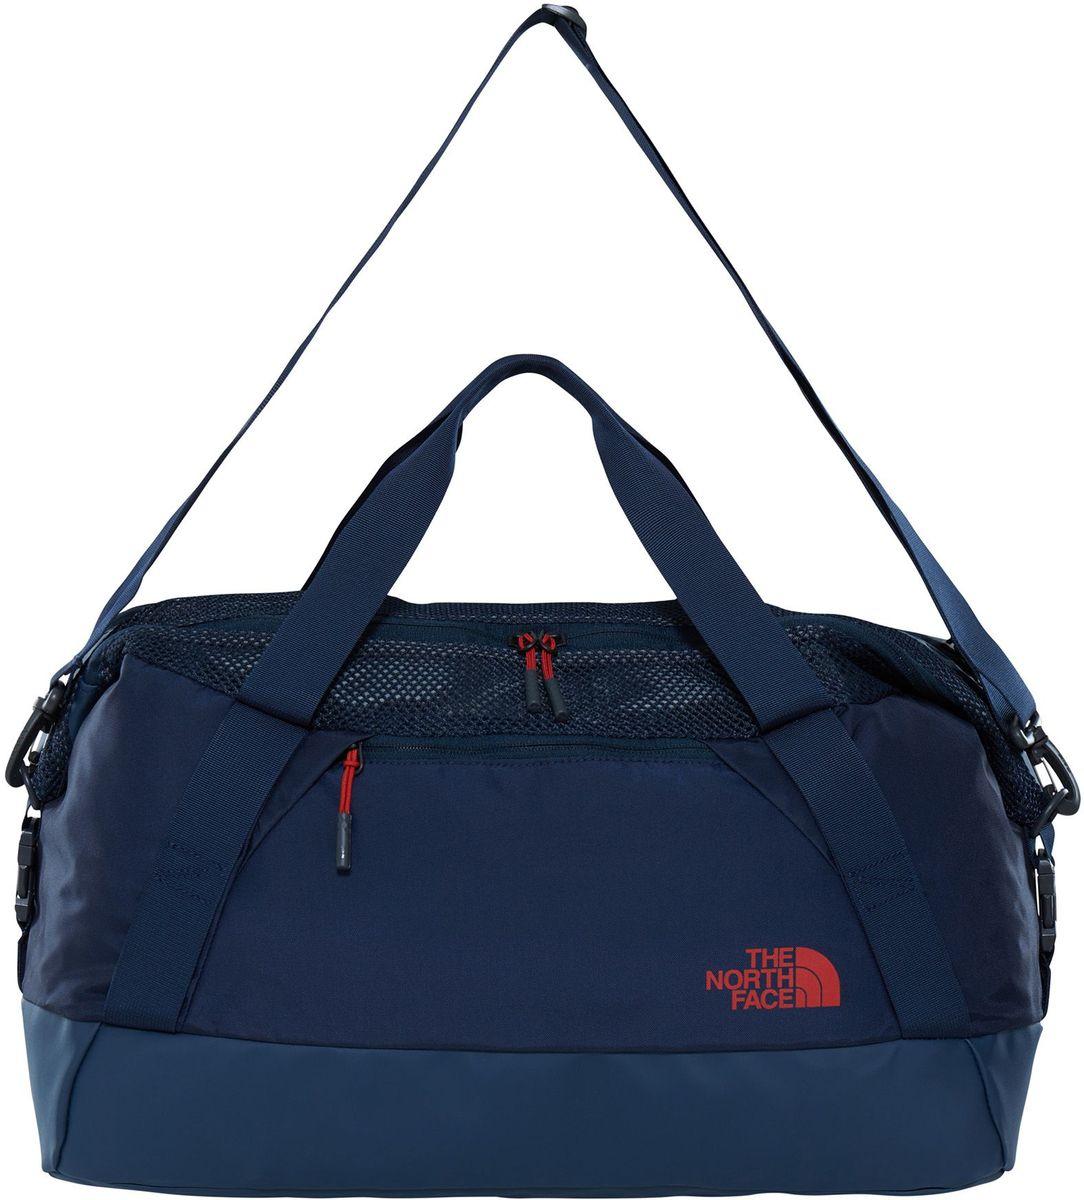 the north face tnf apex gym duffel city travel sport bag. Black Bedroom Furniture Sets. Home Design Ideas